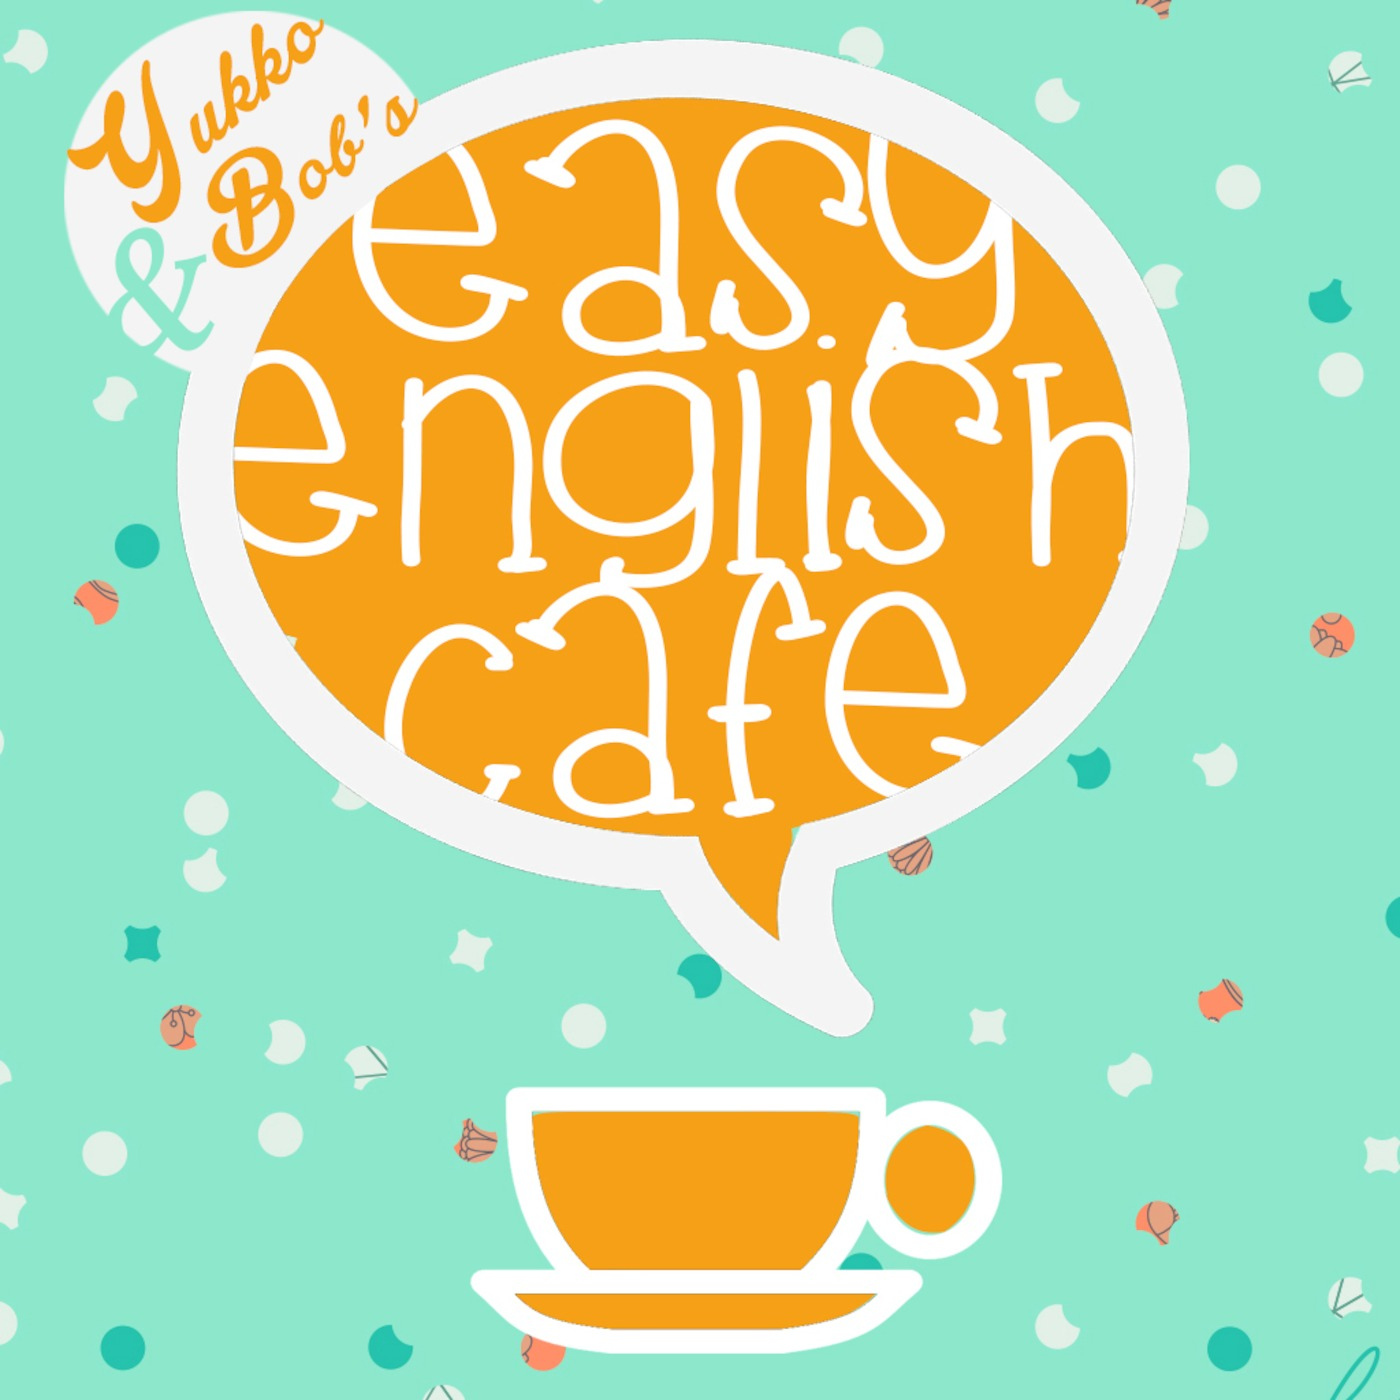 Yukko&Bob's Easy English Cafe sponsored by FLATMATE